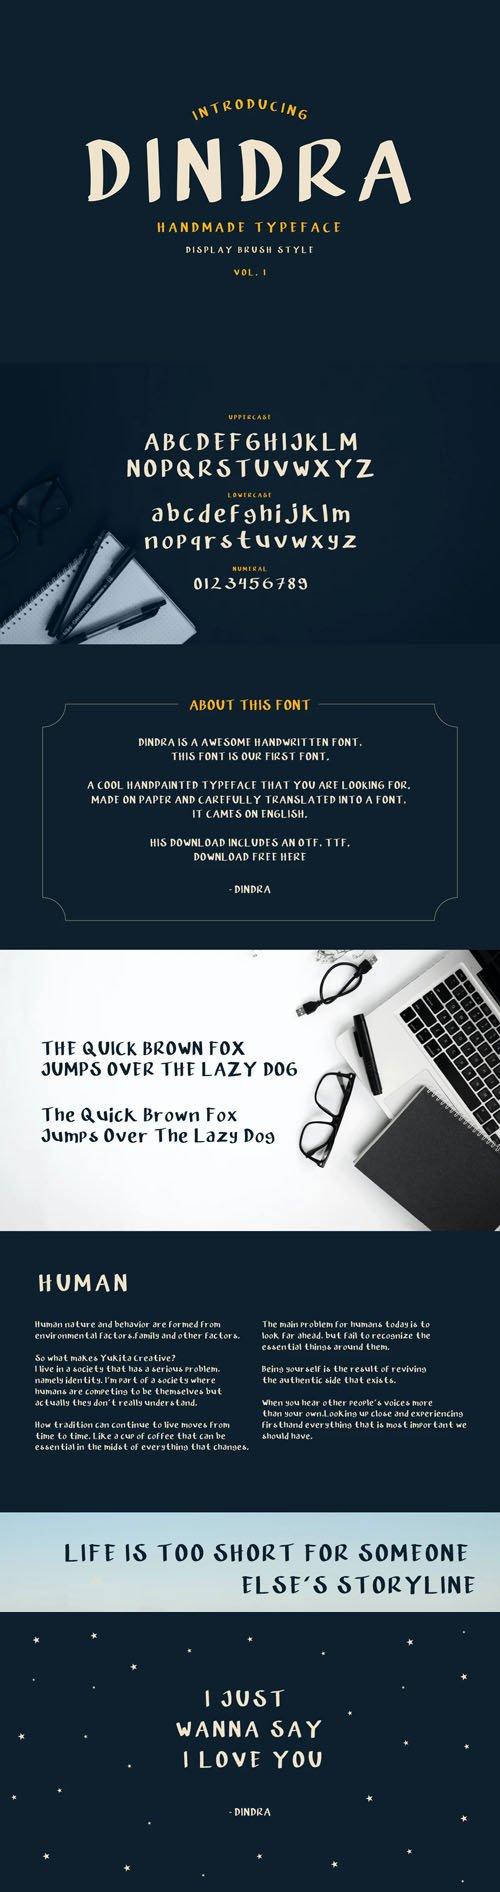 Dindra Handmade Typeface - Display Brush Style